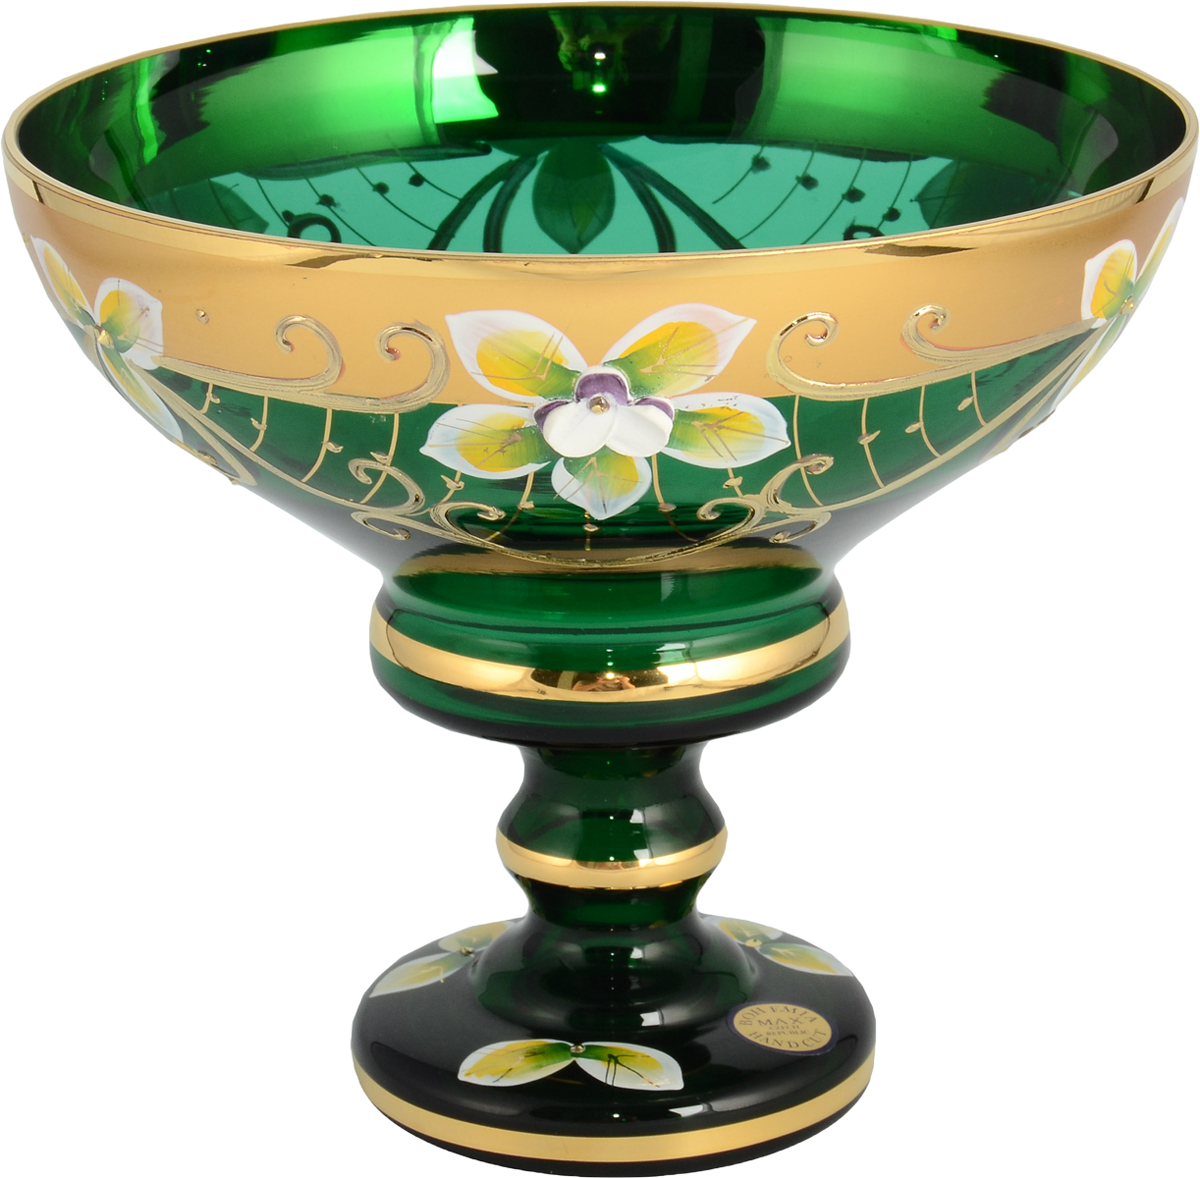 Конфетница Star Crystal, цвет: зеленый, 13 см. 24527